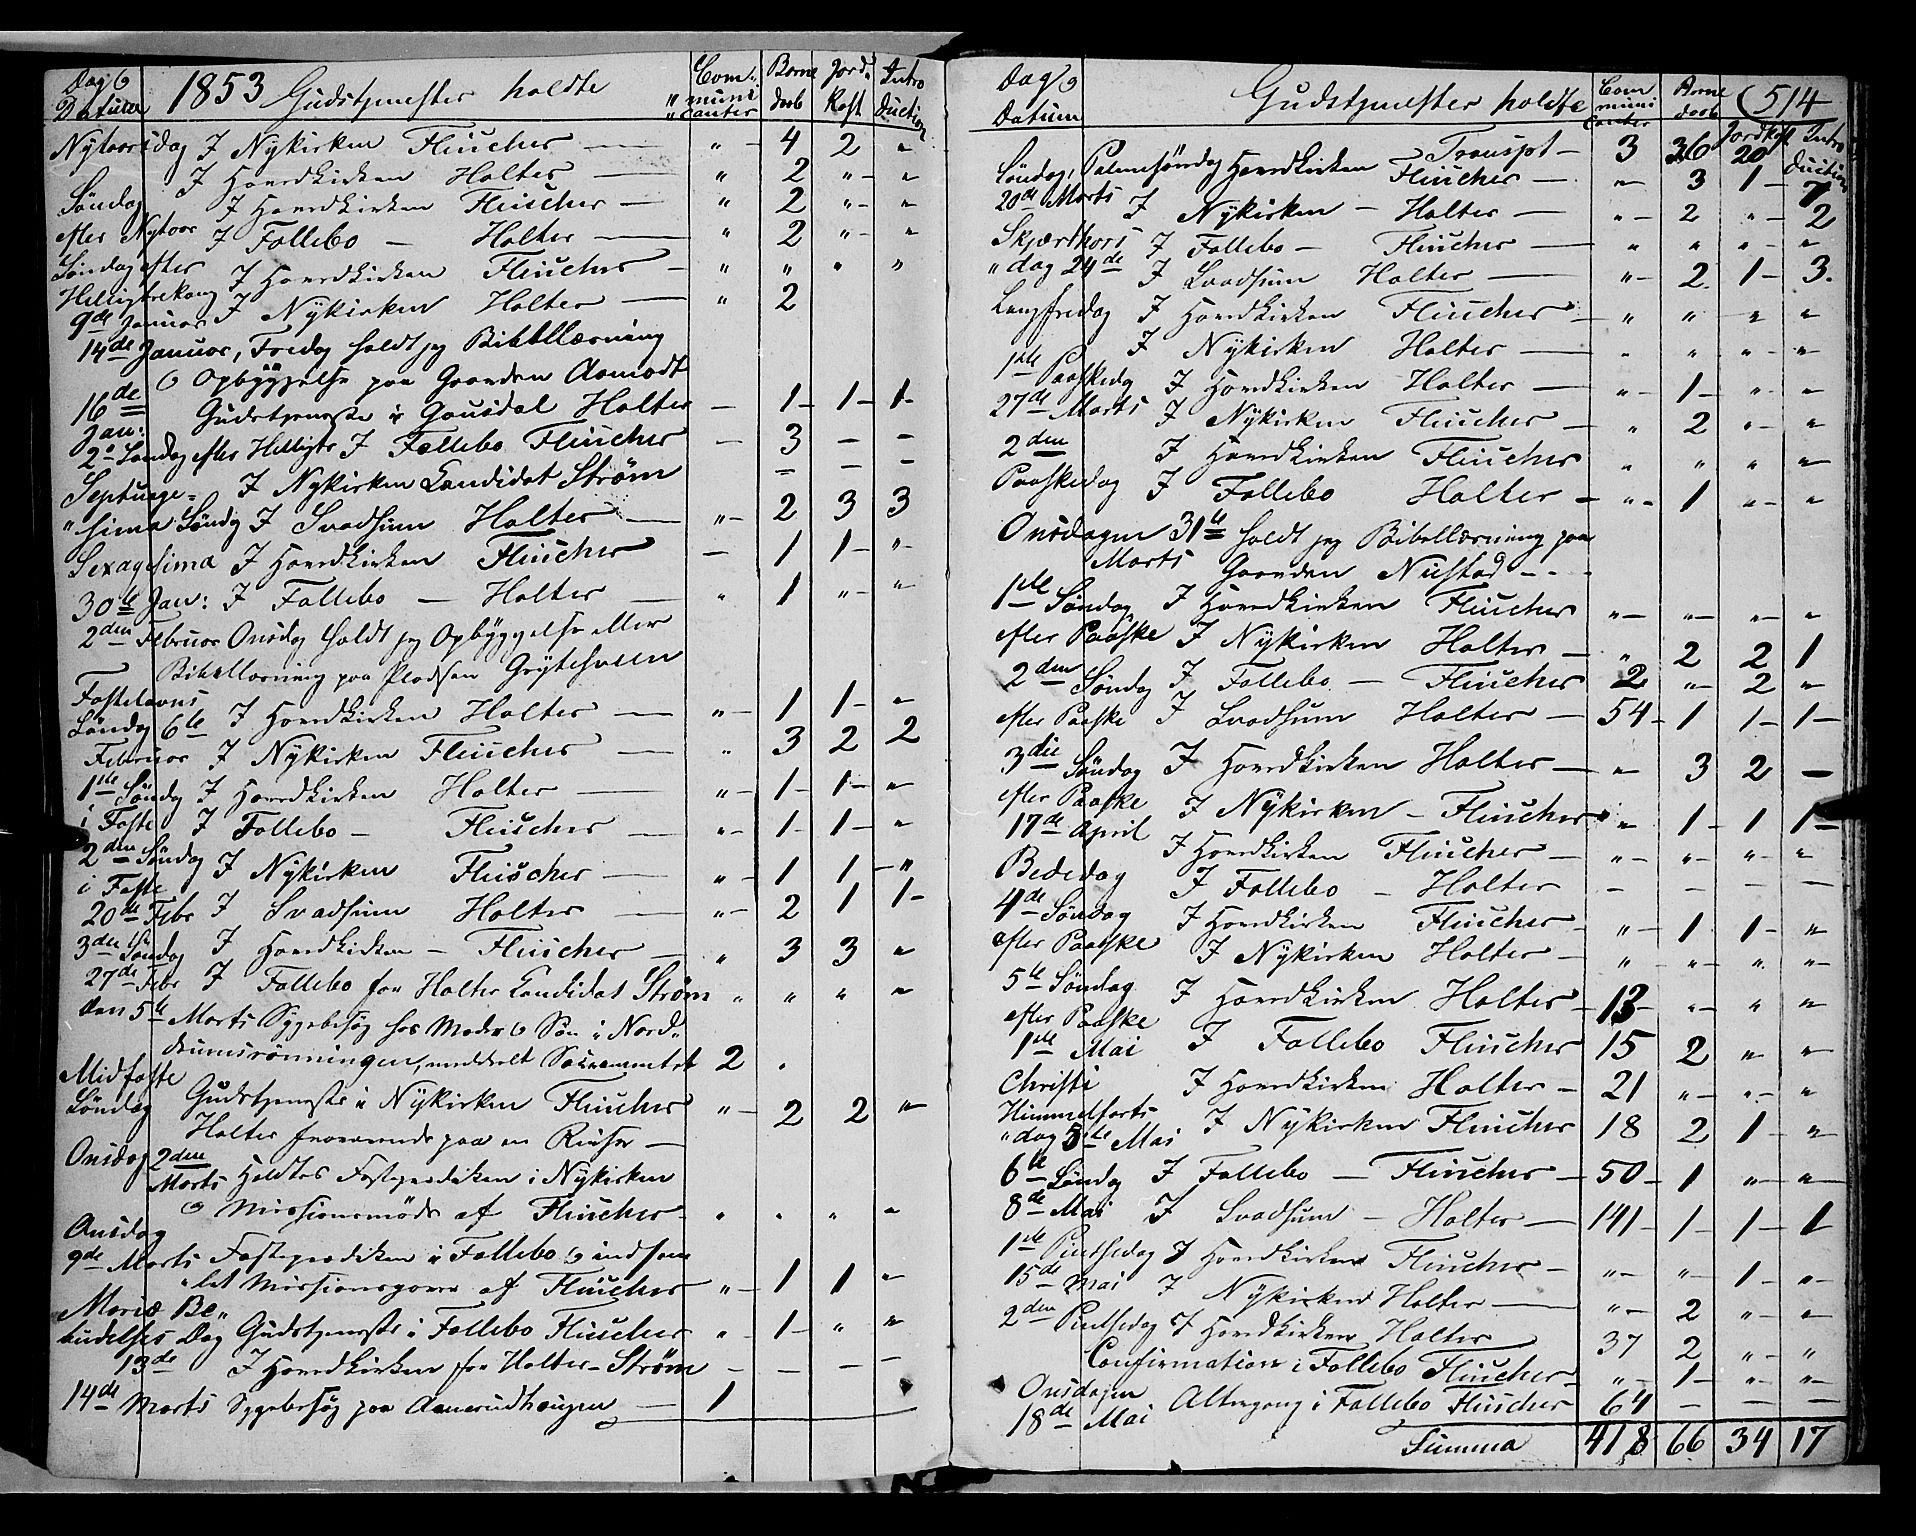 SAH, Gausdal prestekontor, Ministerialbok nr. 8, 1850-1861, s. 514